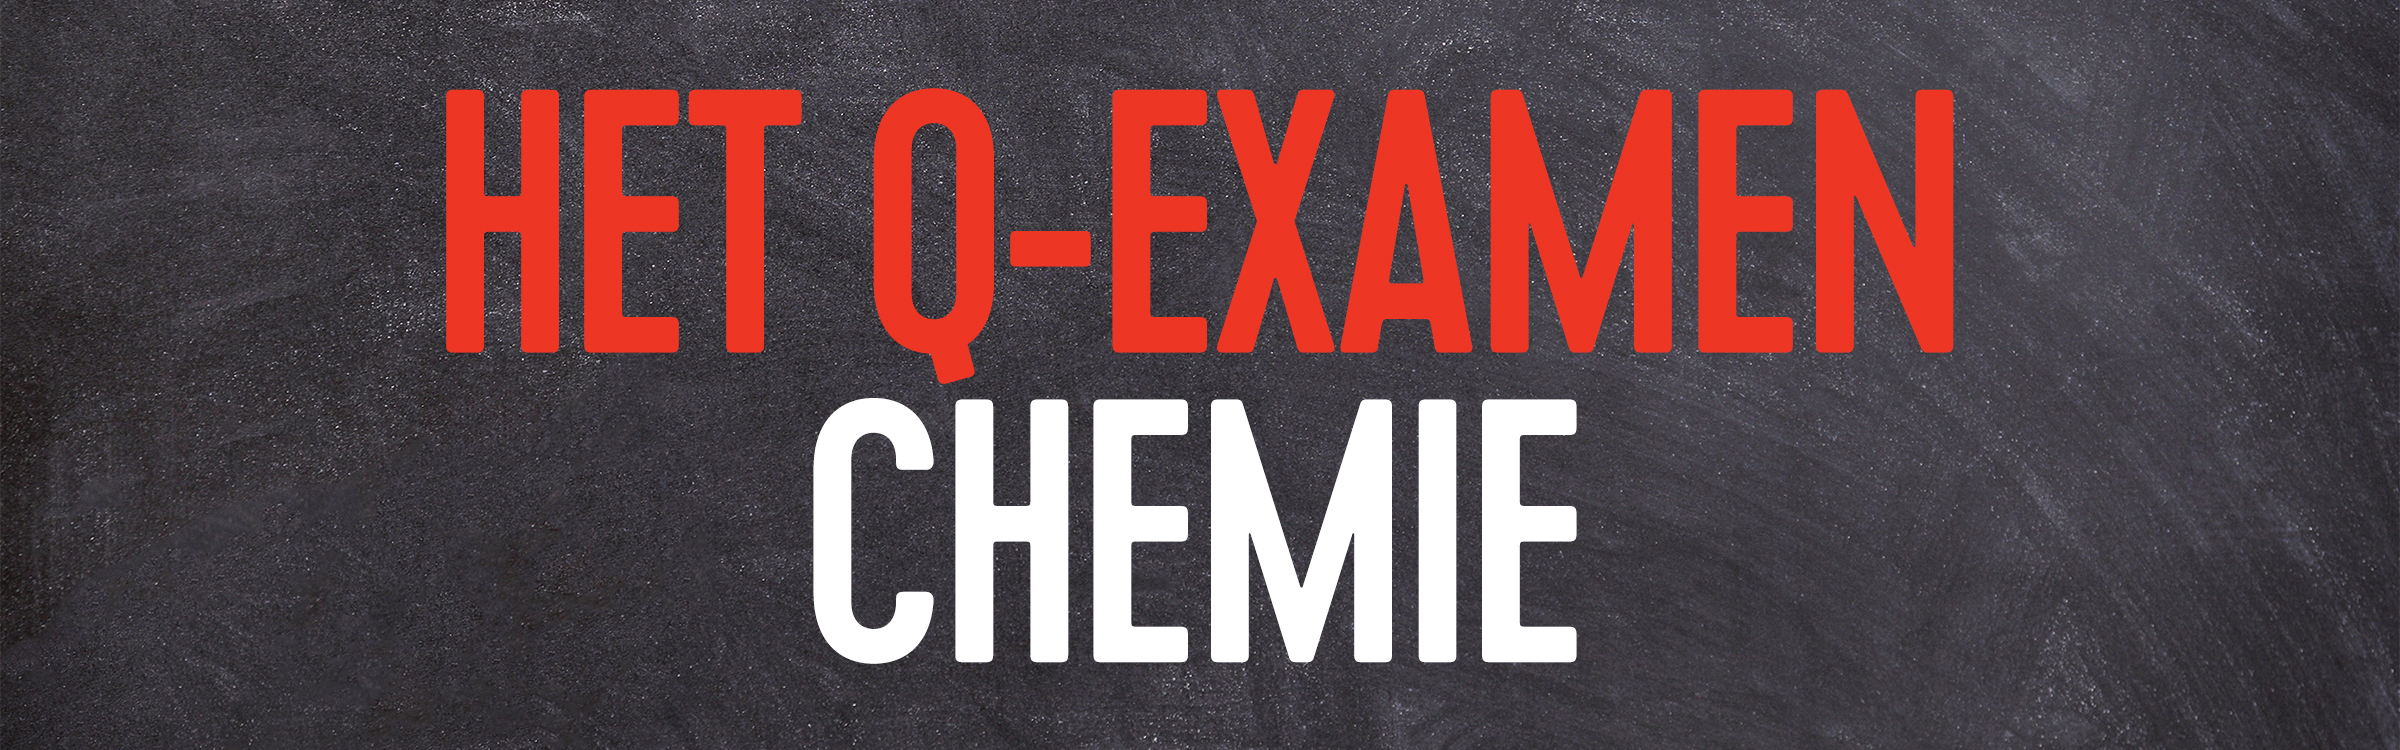 Q examen chemie header